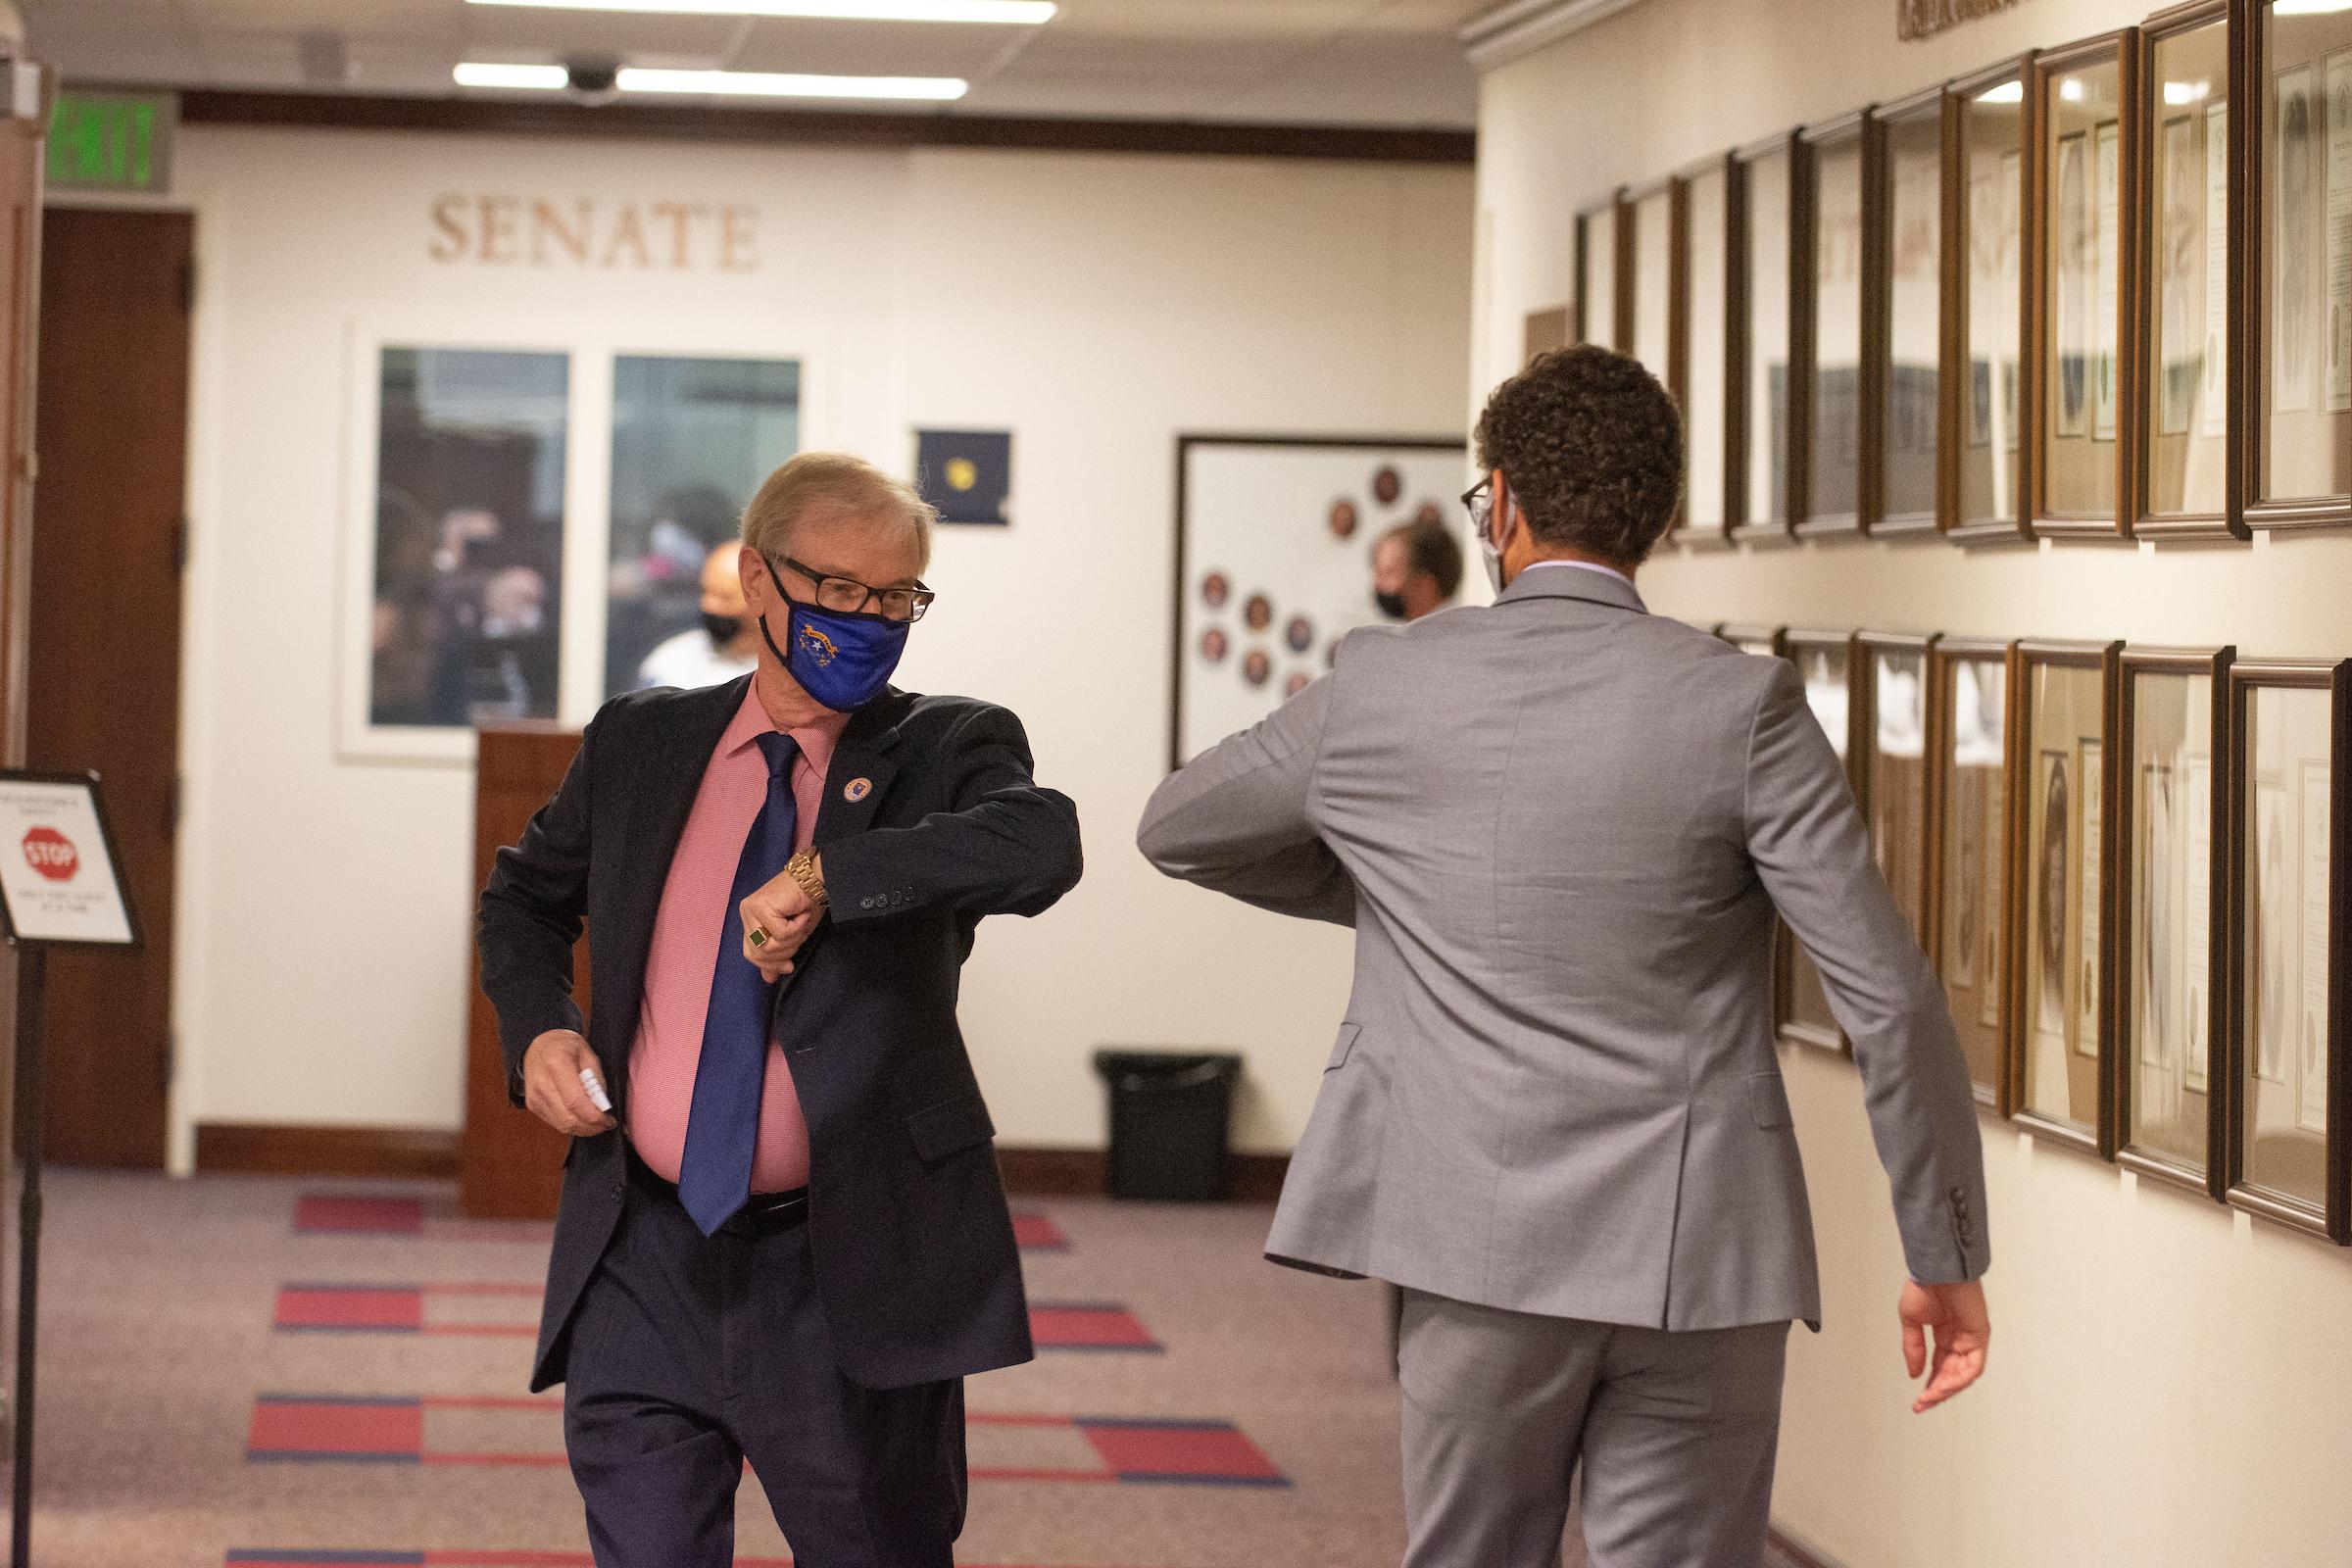 State Senator David Parks, left, greets, Assemblyman Howard Watts II